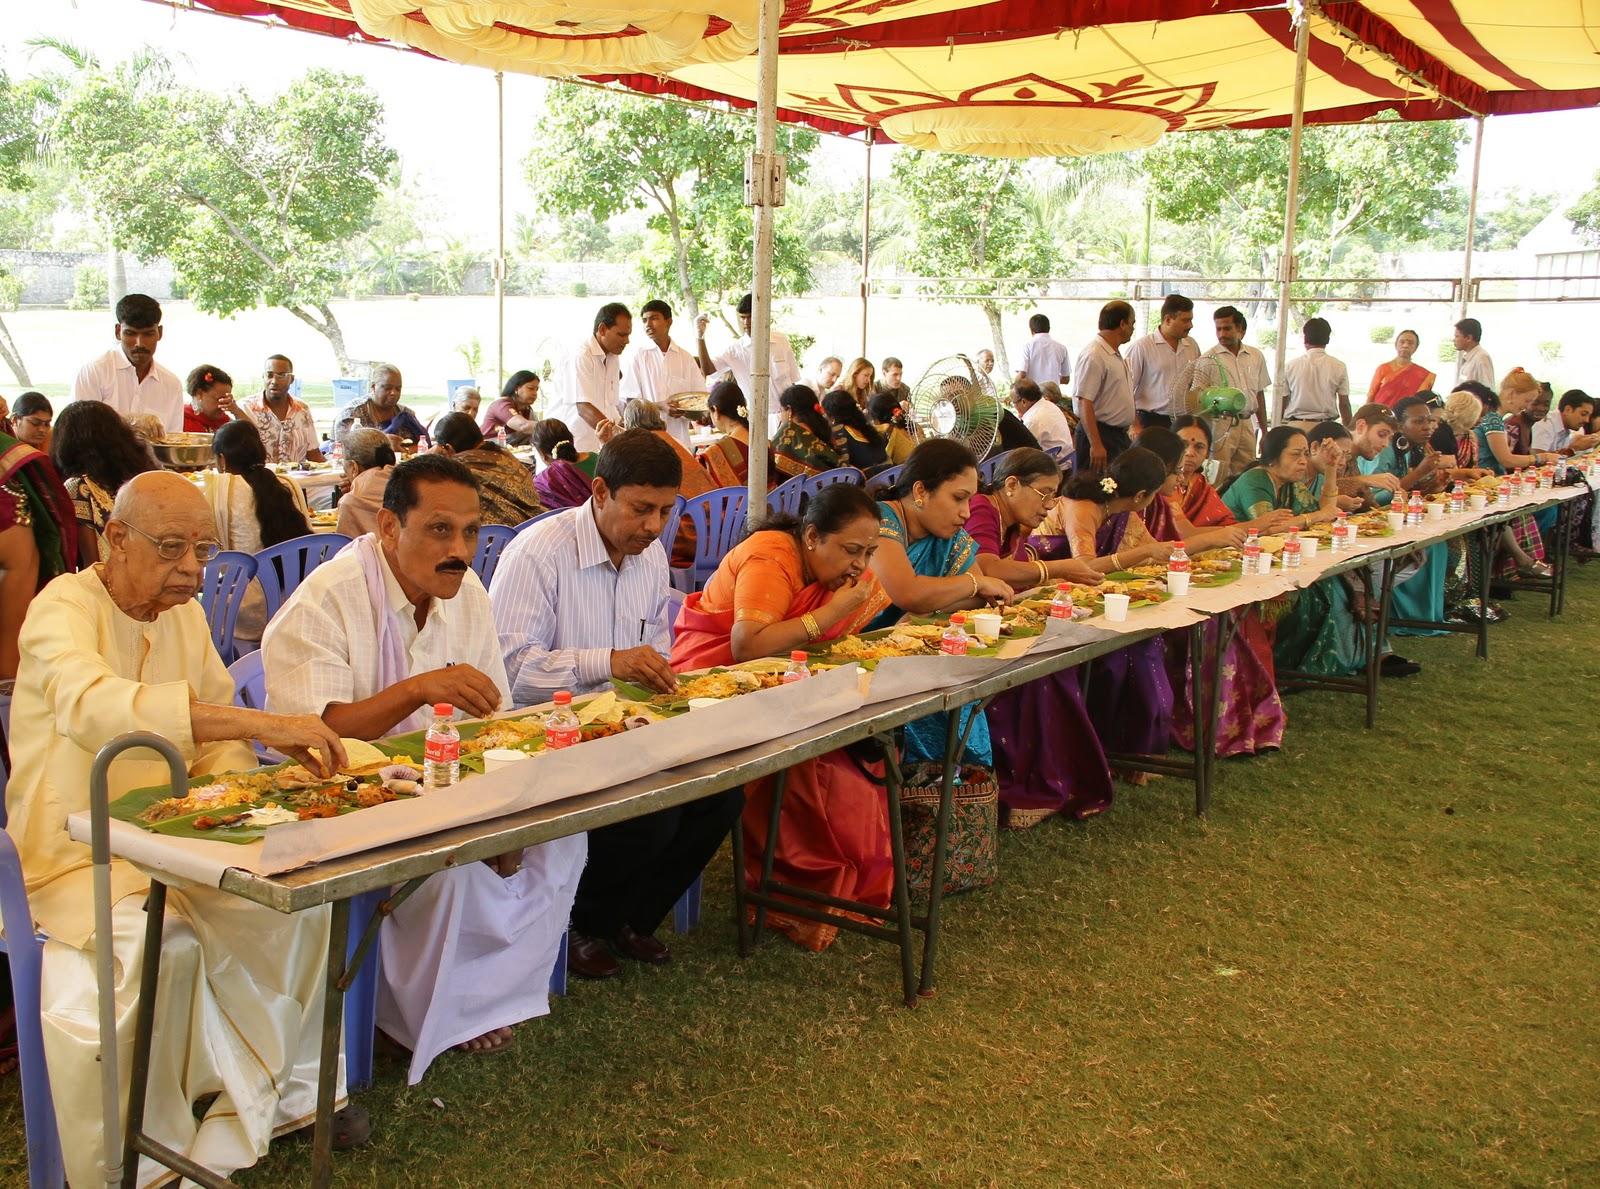 Indian Cuisine The Etiquettes Food Habits